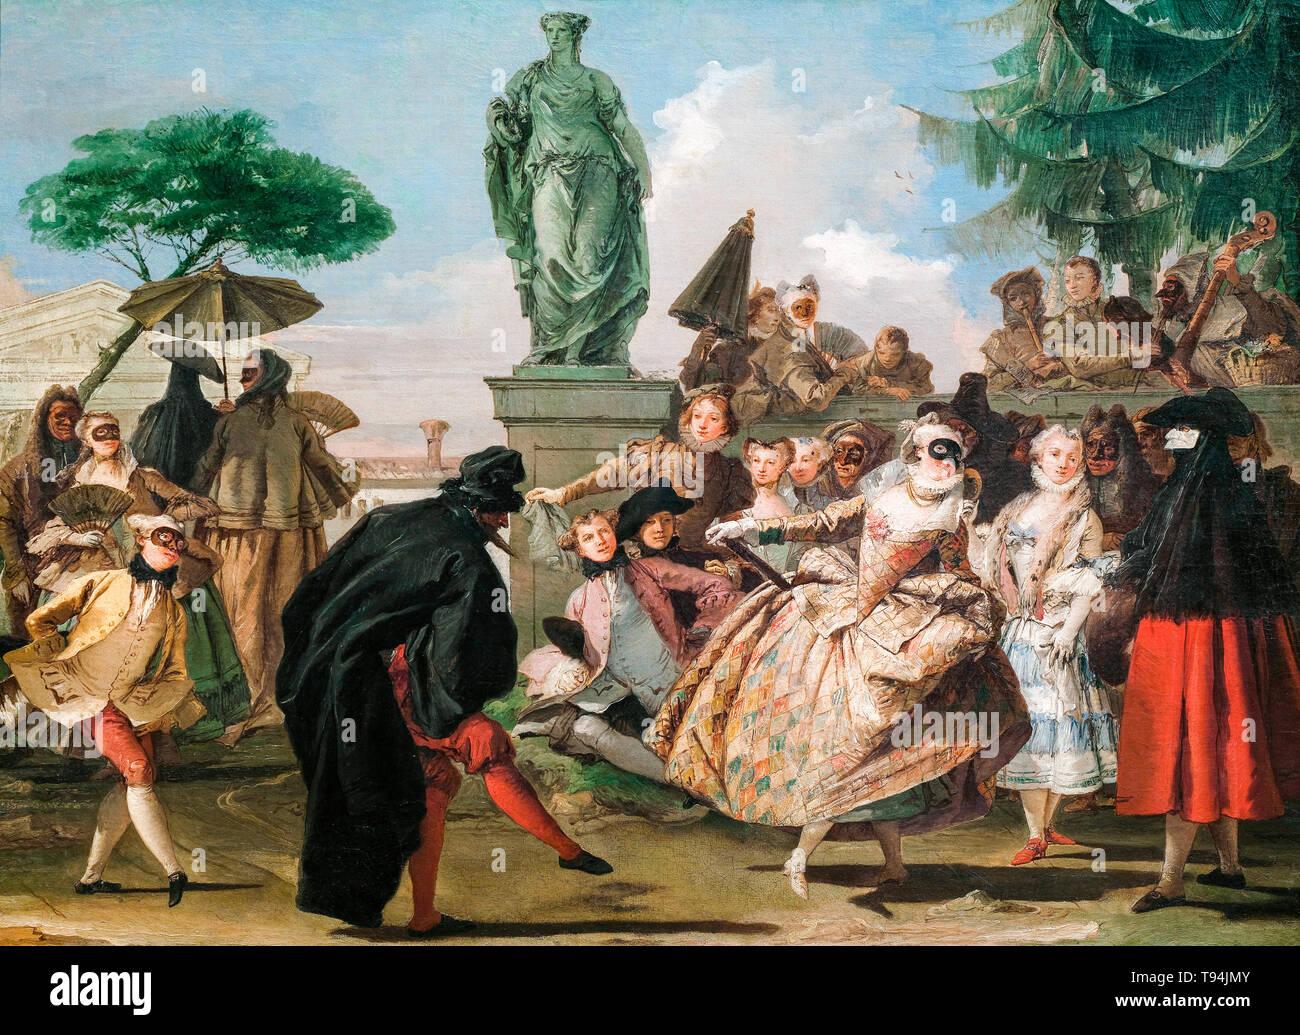 Giovanni Domenico Tiepolo, The Minuet, painting 1756 - Stock Image